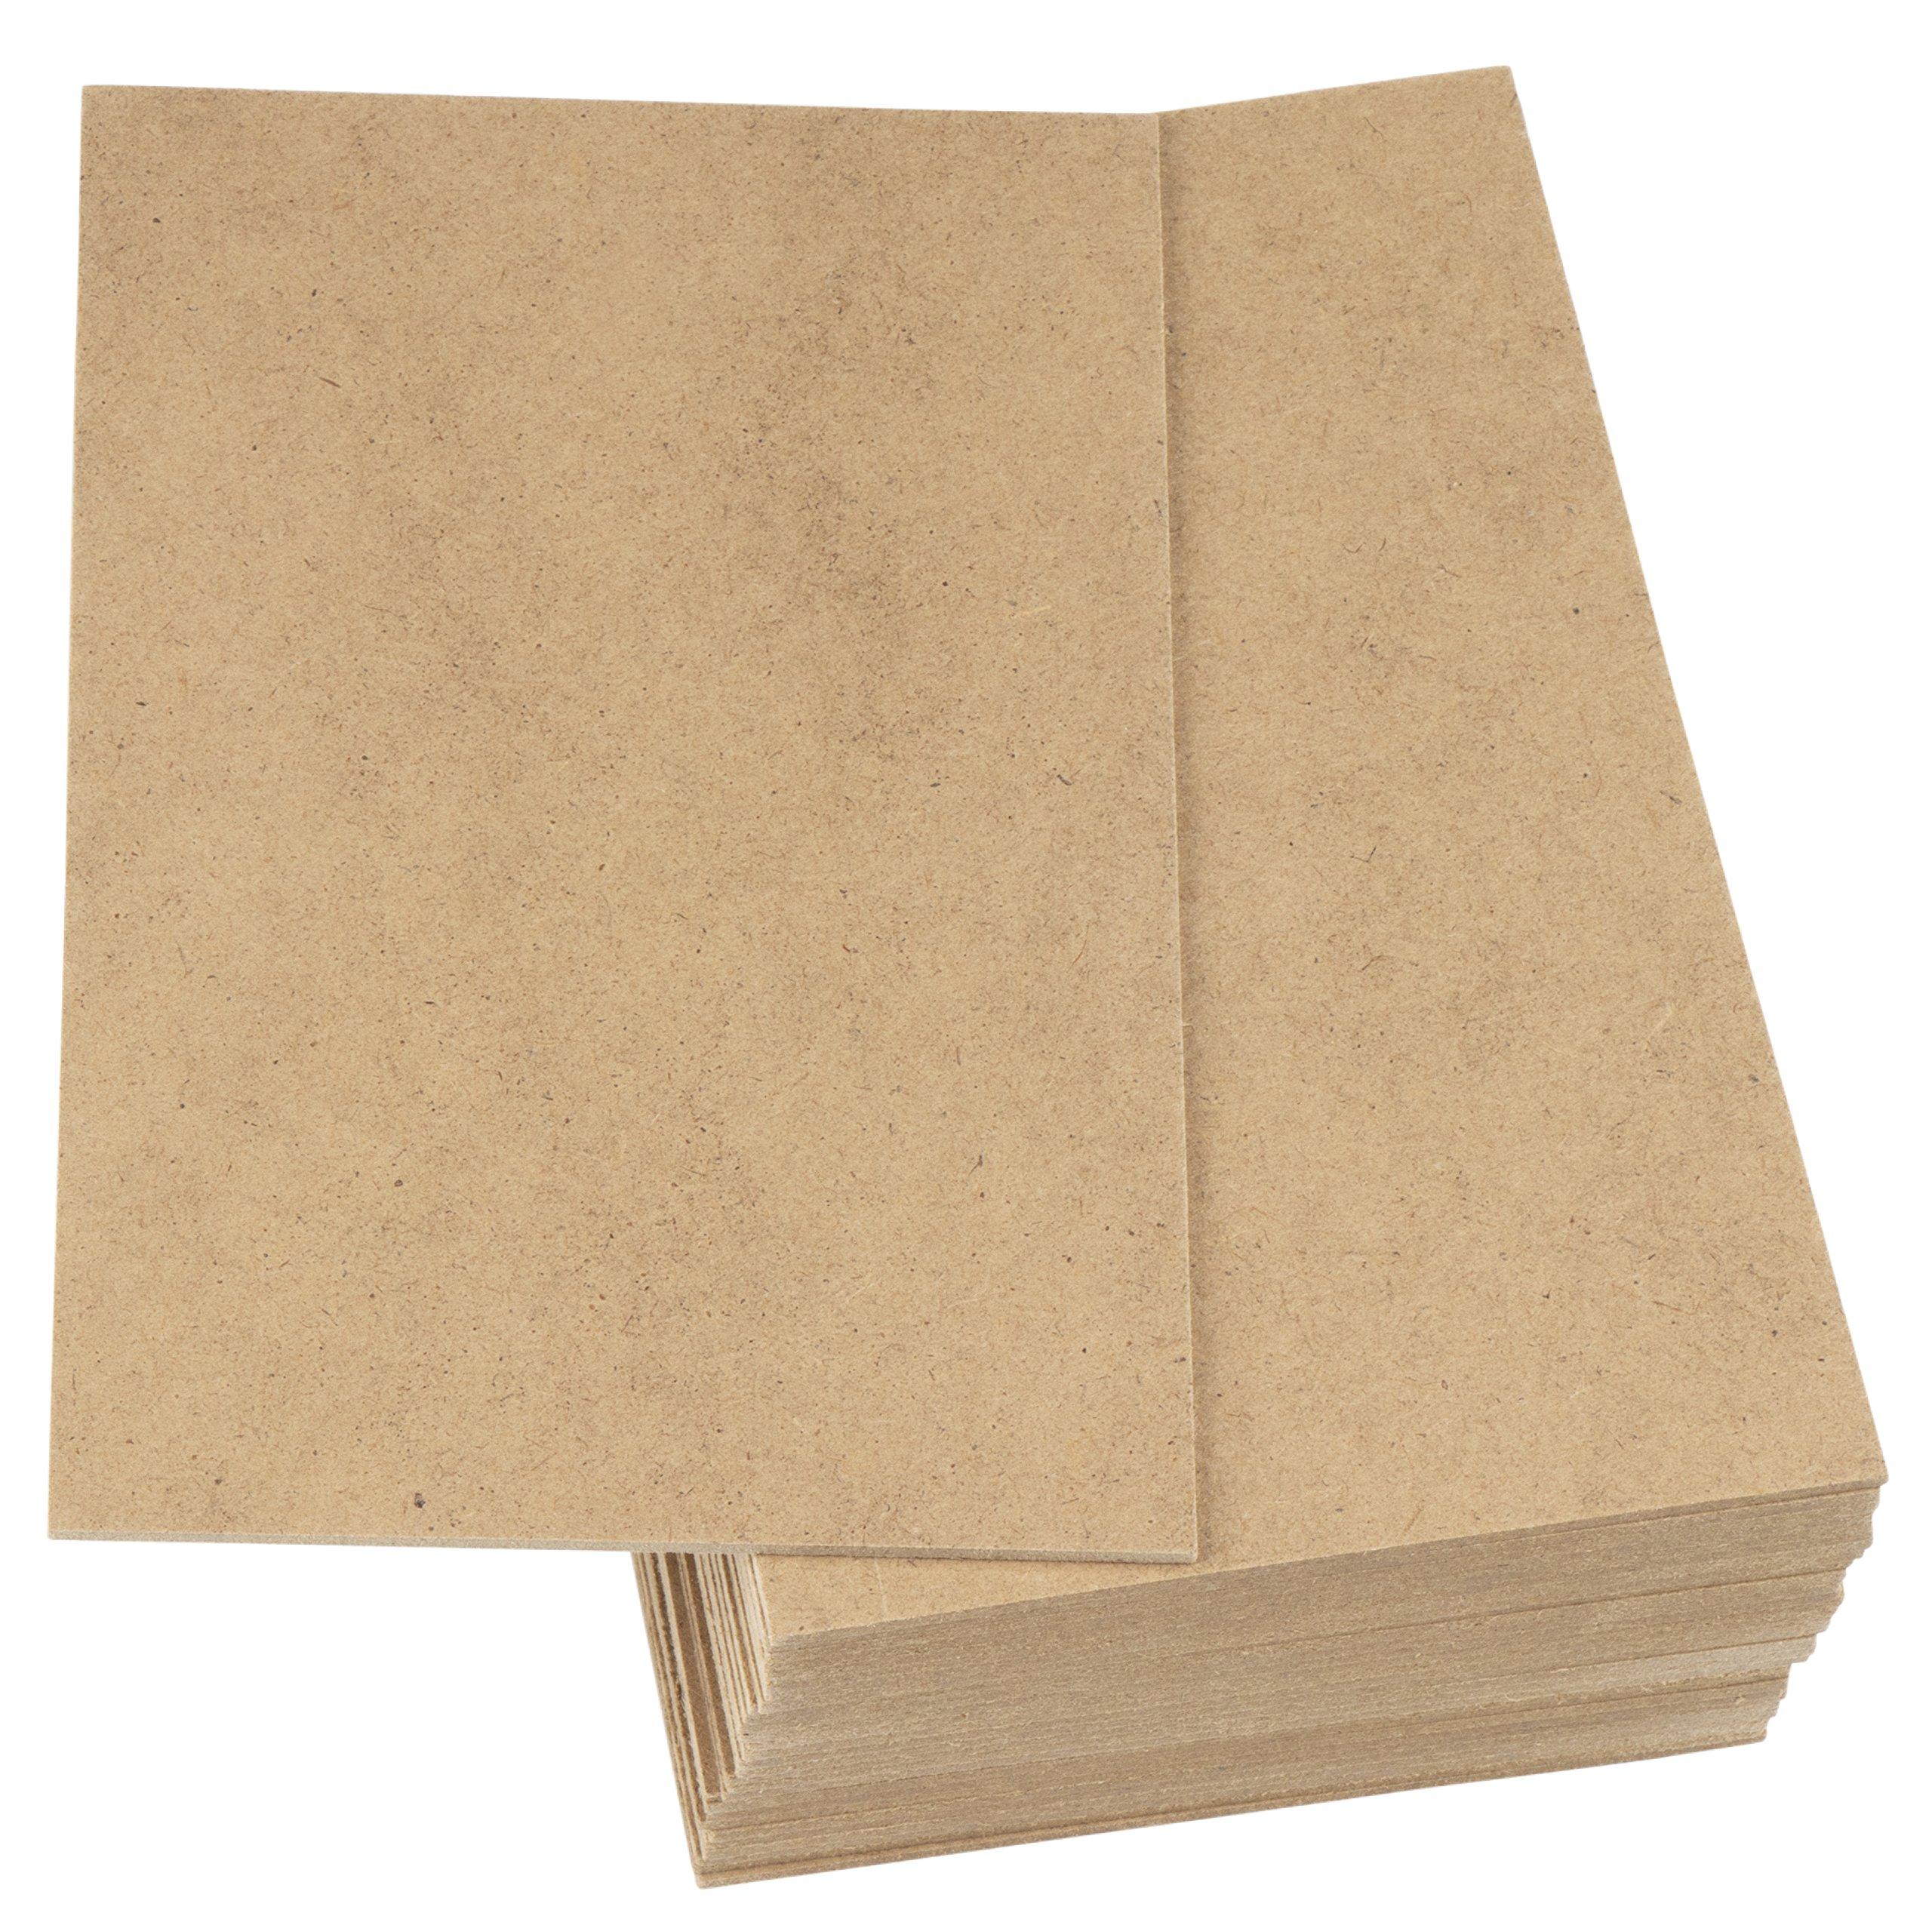 MDF Board - 30-Pack Wood Board, Medium Density Fibreboard, Hardwood Board, Brown, 5.875 x 7.875 x 0.0625 inches